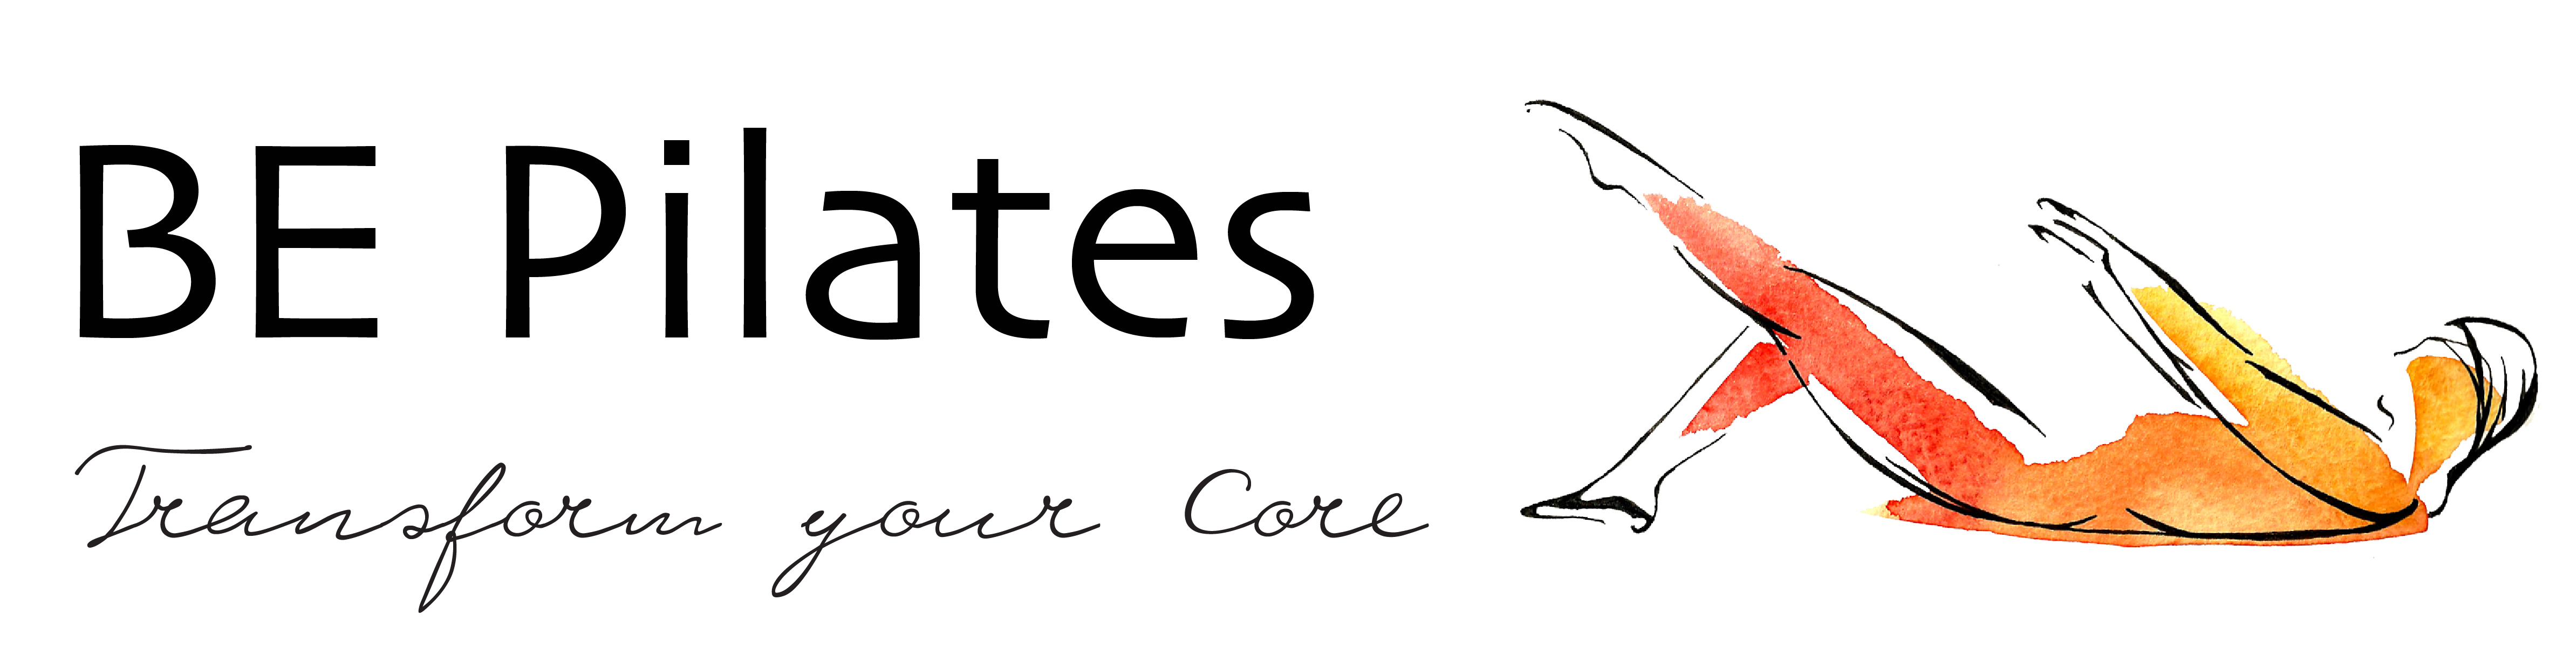 JenWard-programlogos-pilates